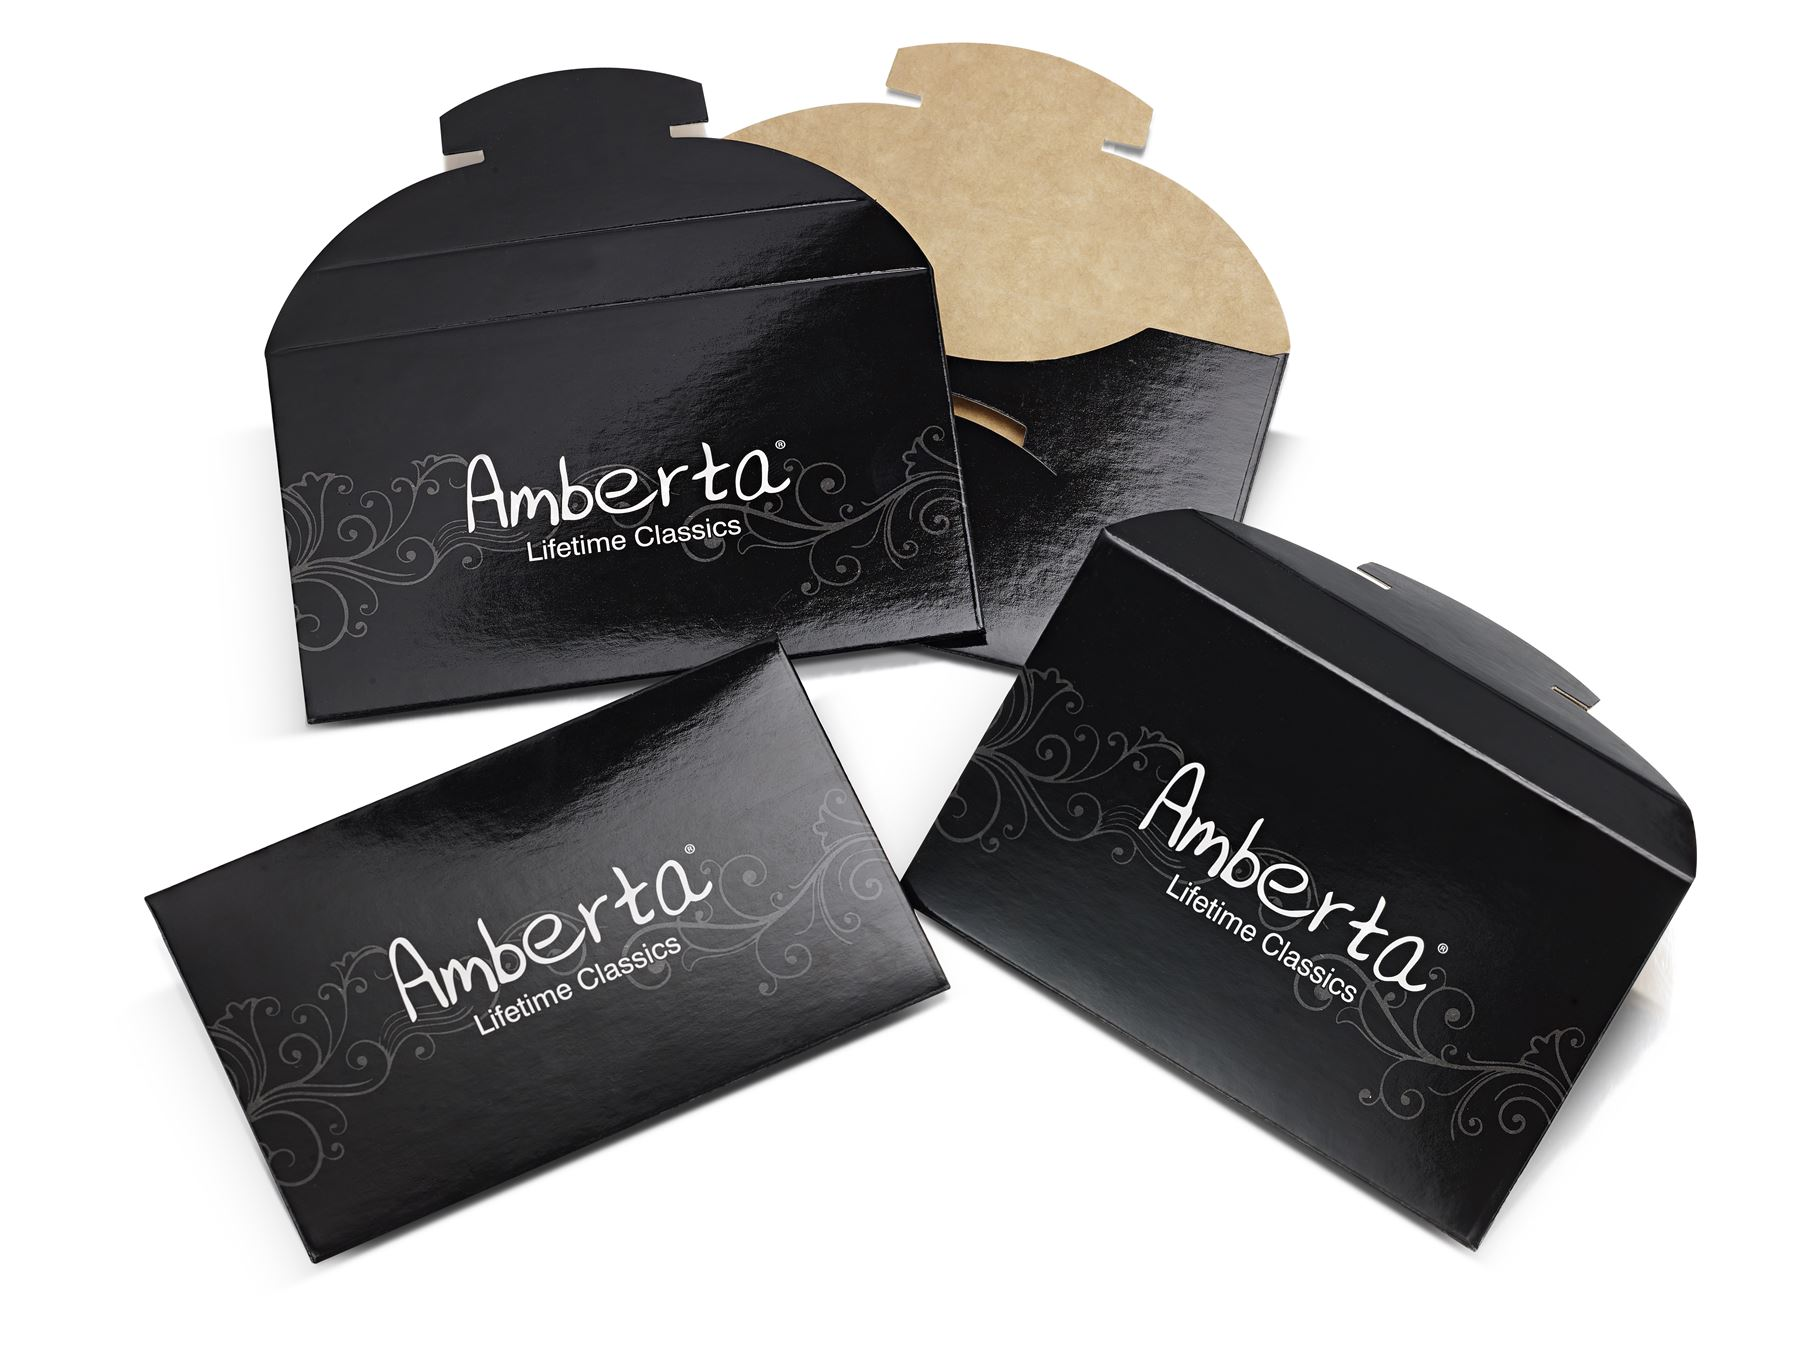 Amberta-Jewelry-925-Sterling-Silver-Adjustable-Bracelet-Italian-Bangle-for-Women thumbnail 31